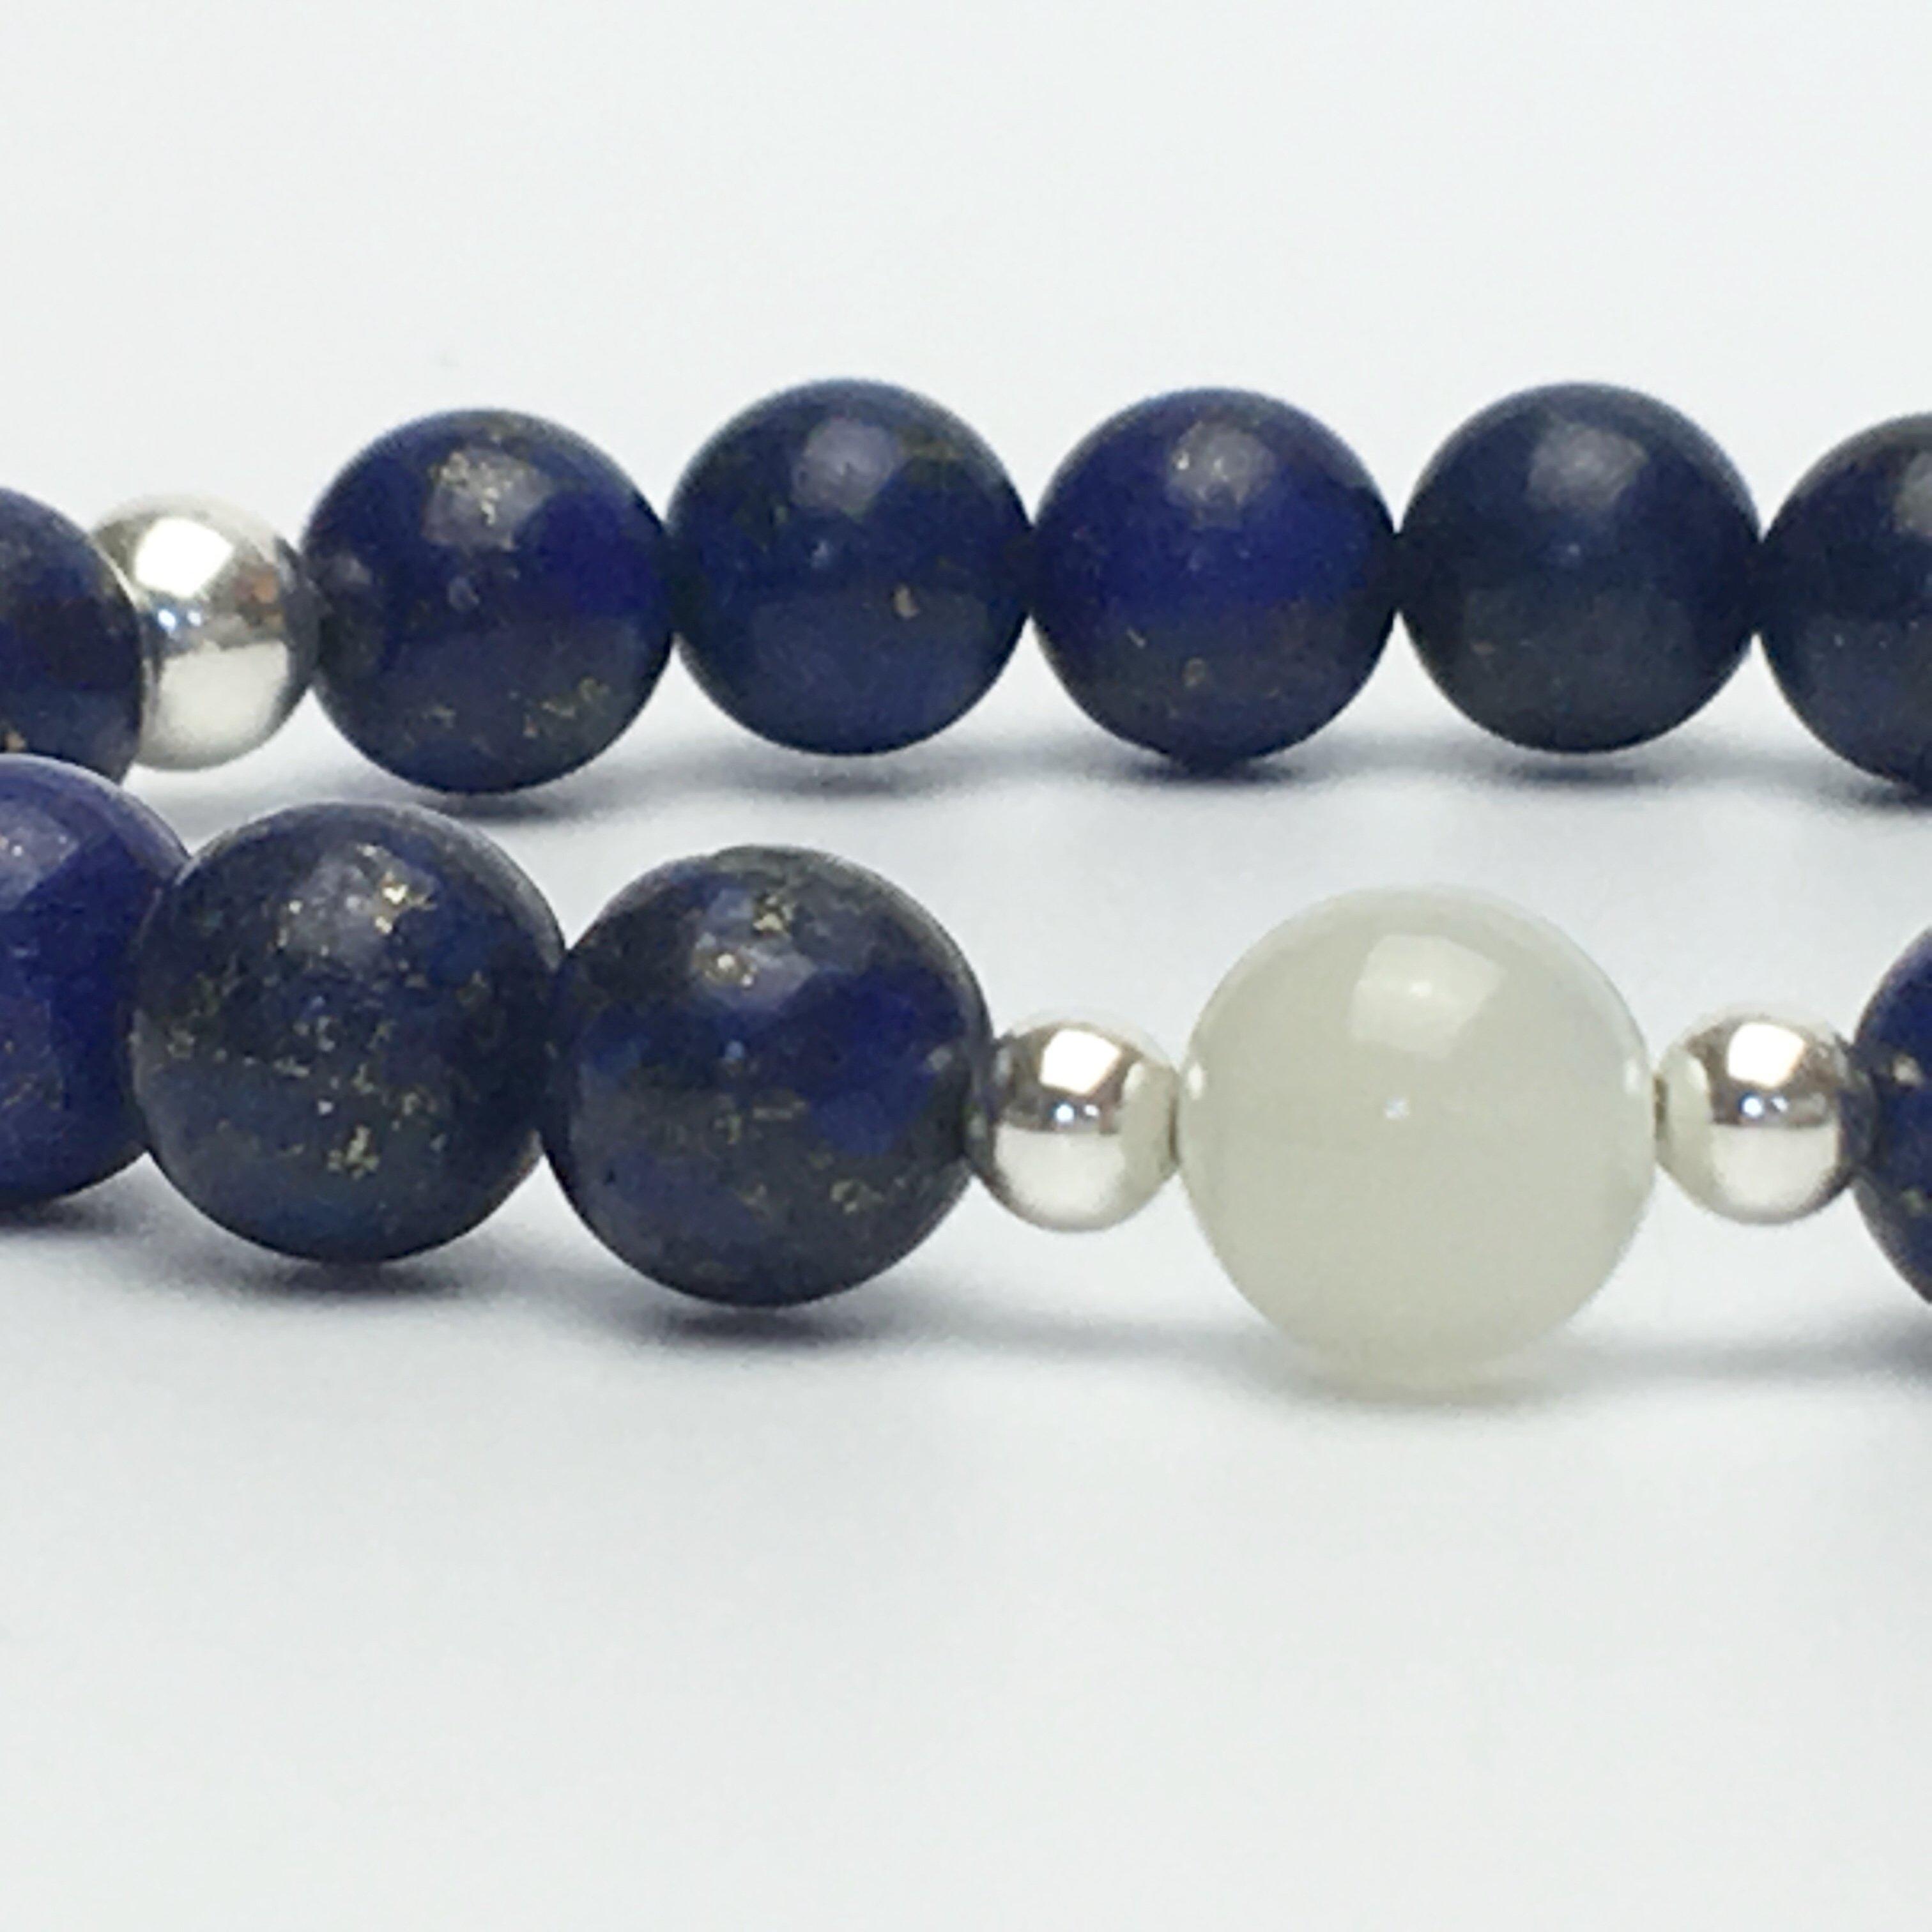 Grade A Lapis Lazuli and Moonstone Bead Bracelet